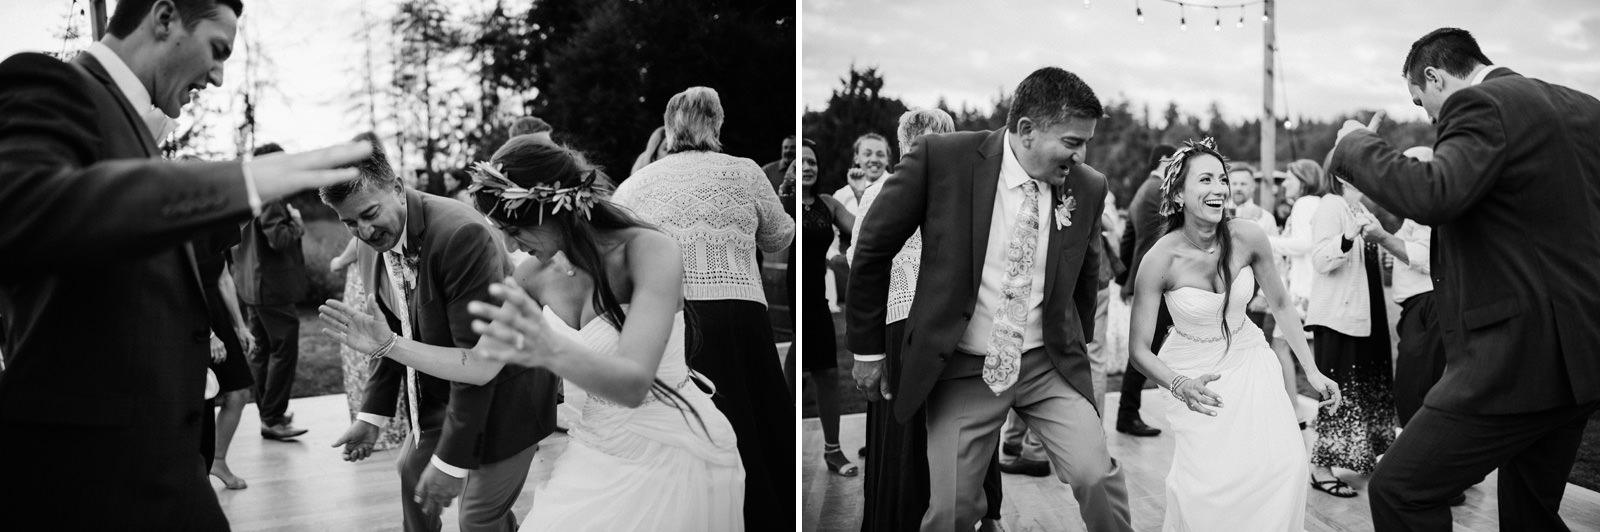 109-woodinville-lavendar-farm-wedding-with-golden-glowy-photos.jpg